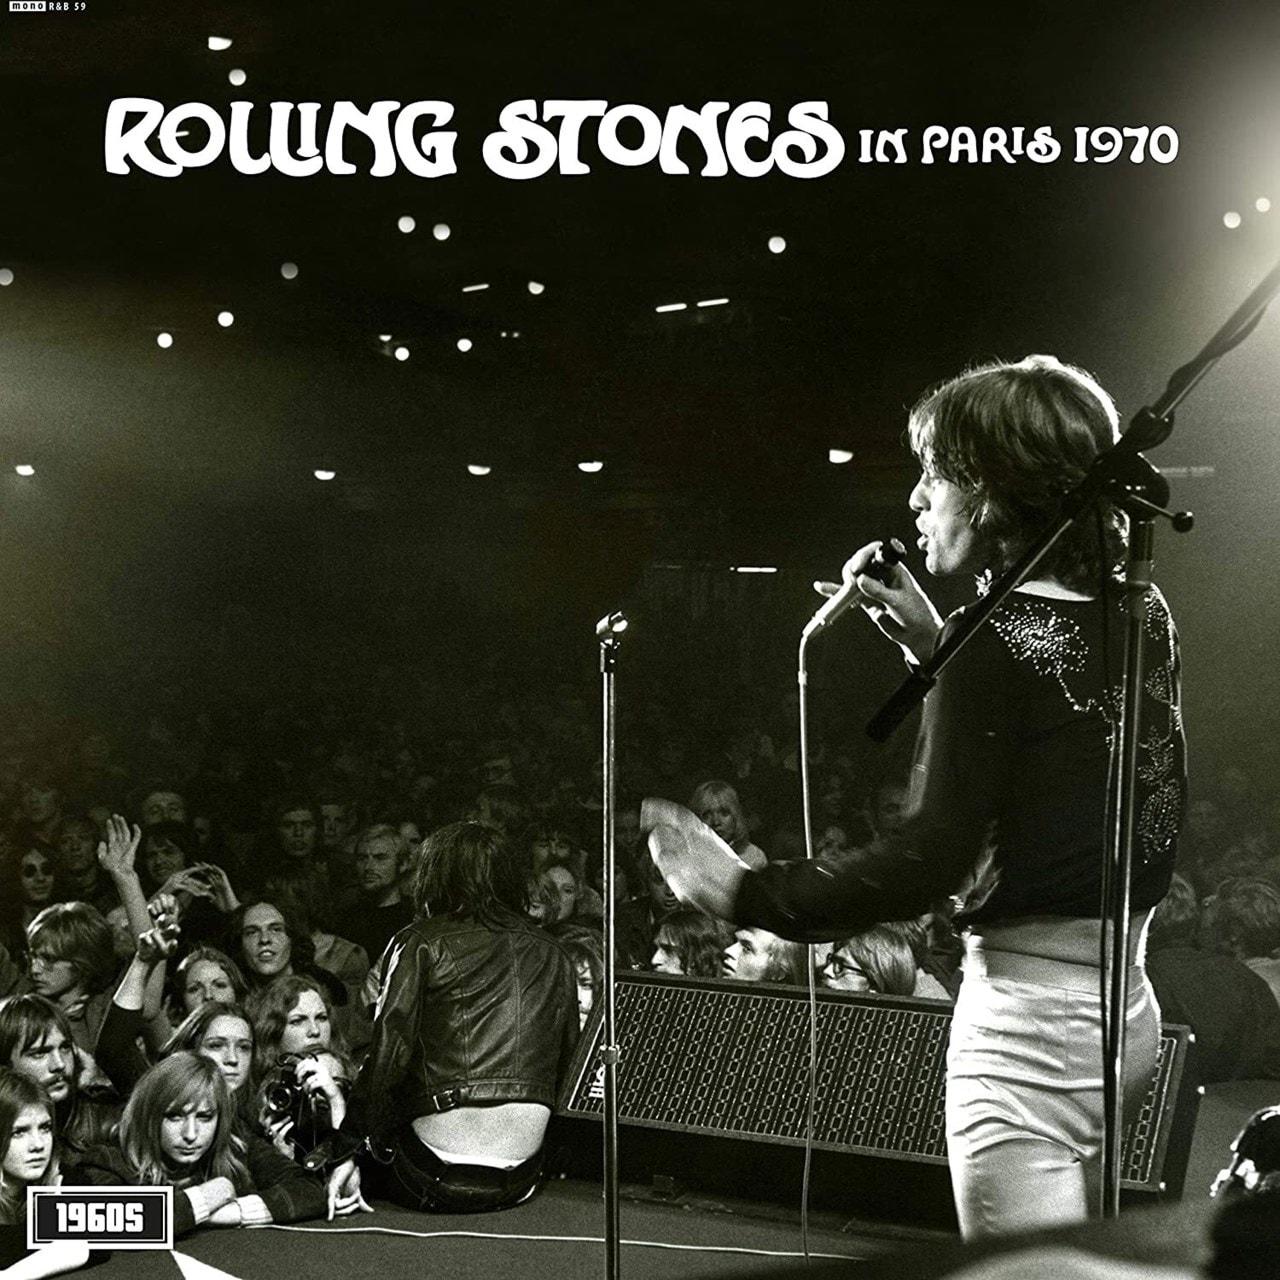 Let the Airwaves Flow: Paris 1970 - Volume 5 - 1